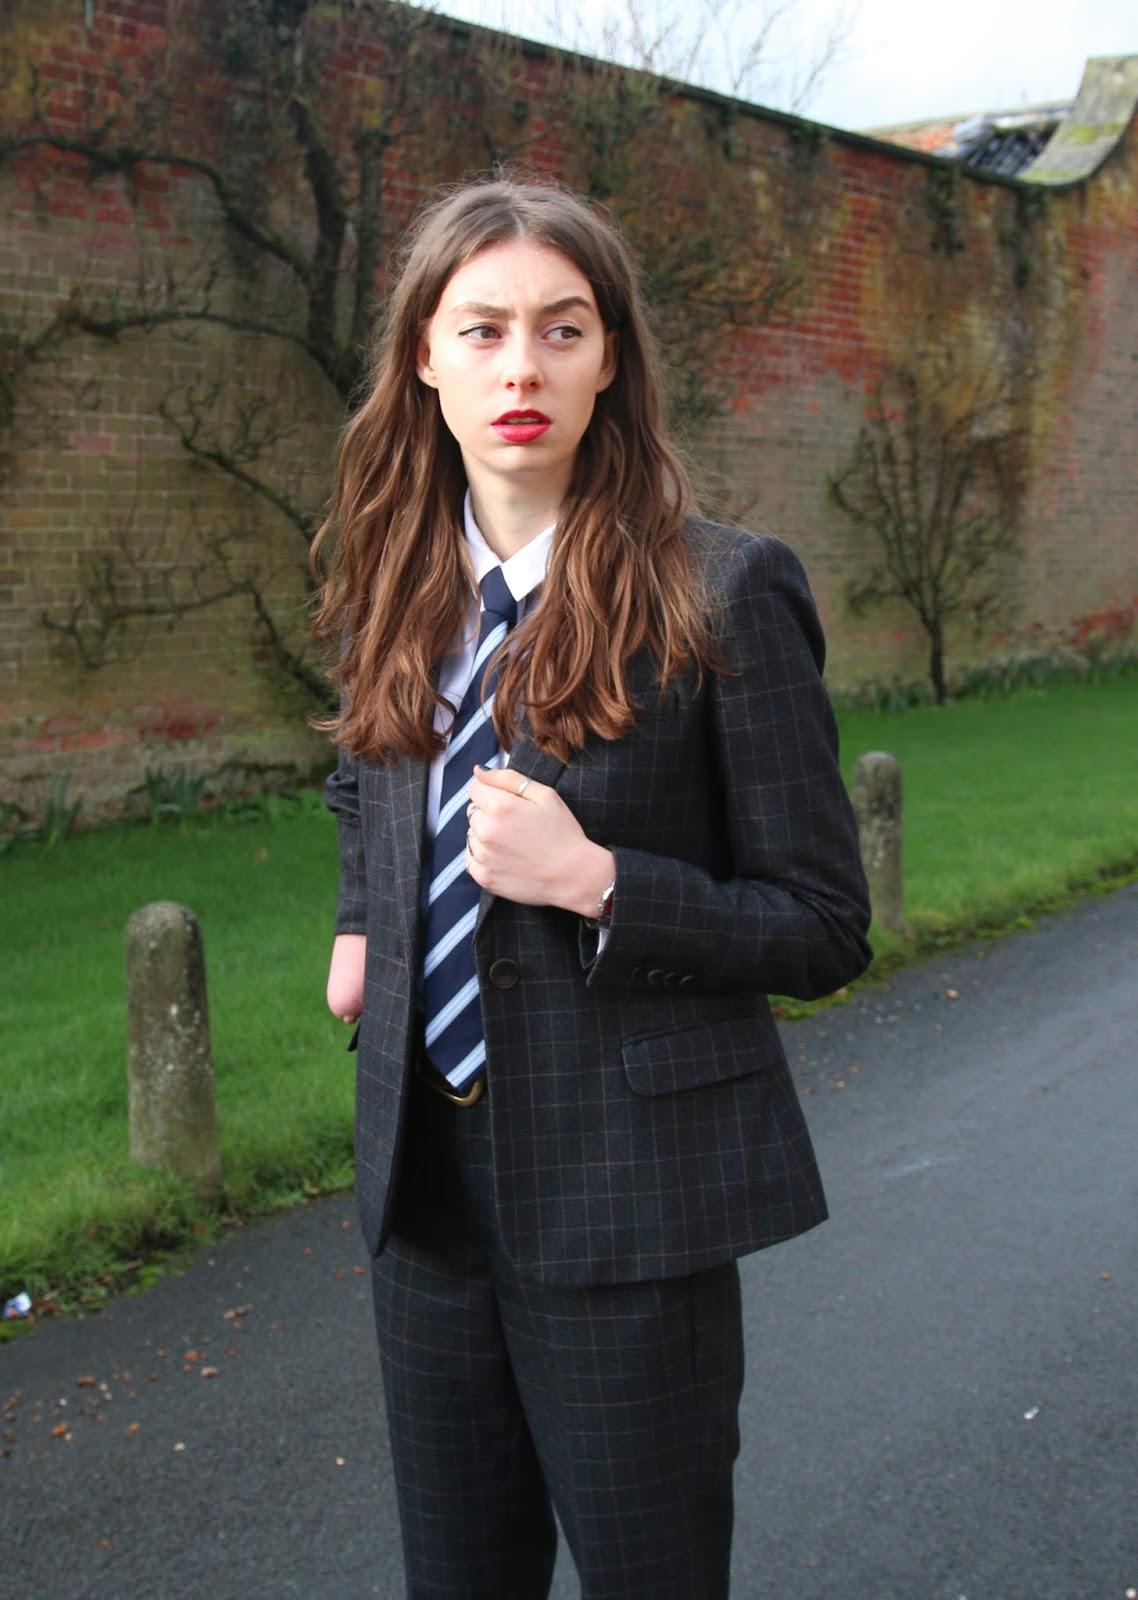 woman in suit, zara, female, women, suit, smart, two piece, zara suit, tie, penguin tie, lipstick, grace mandeville, mandeville sisters,